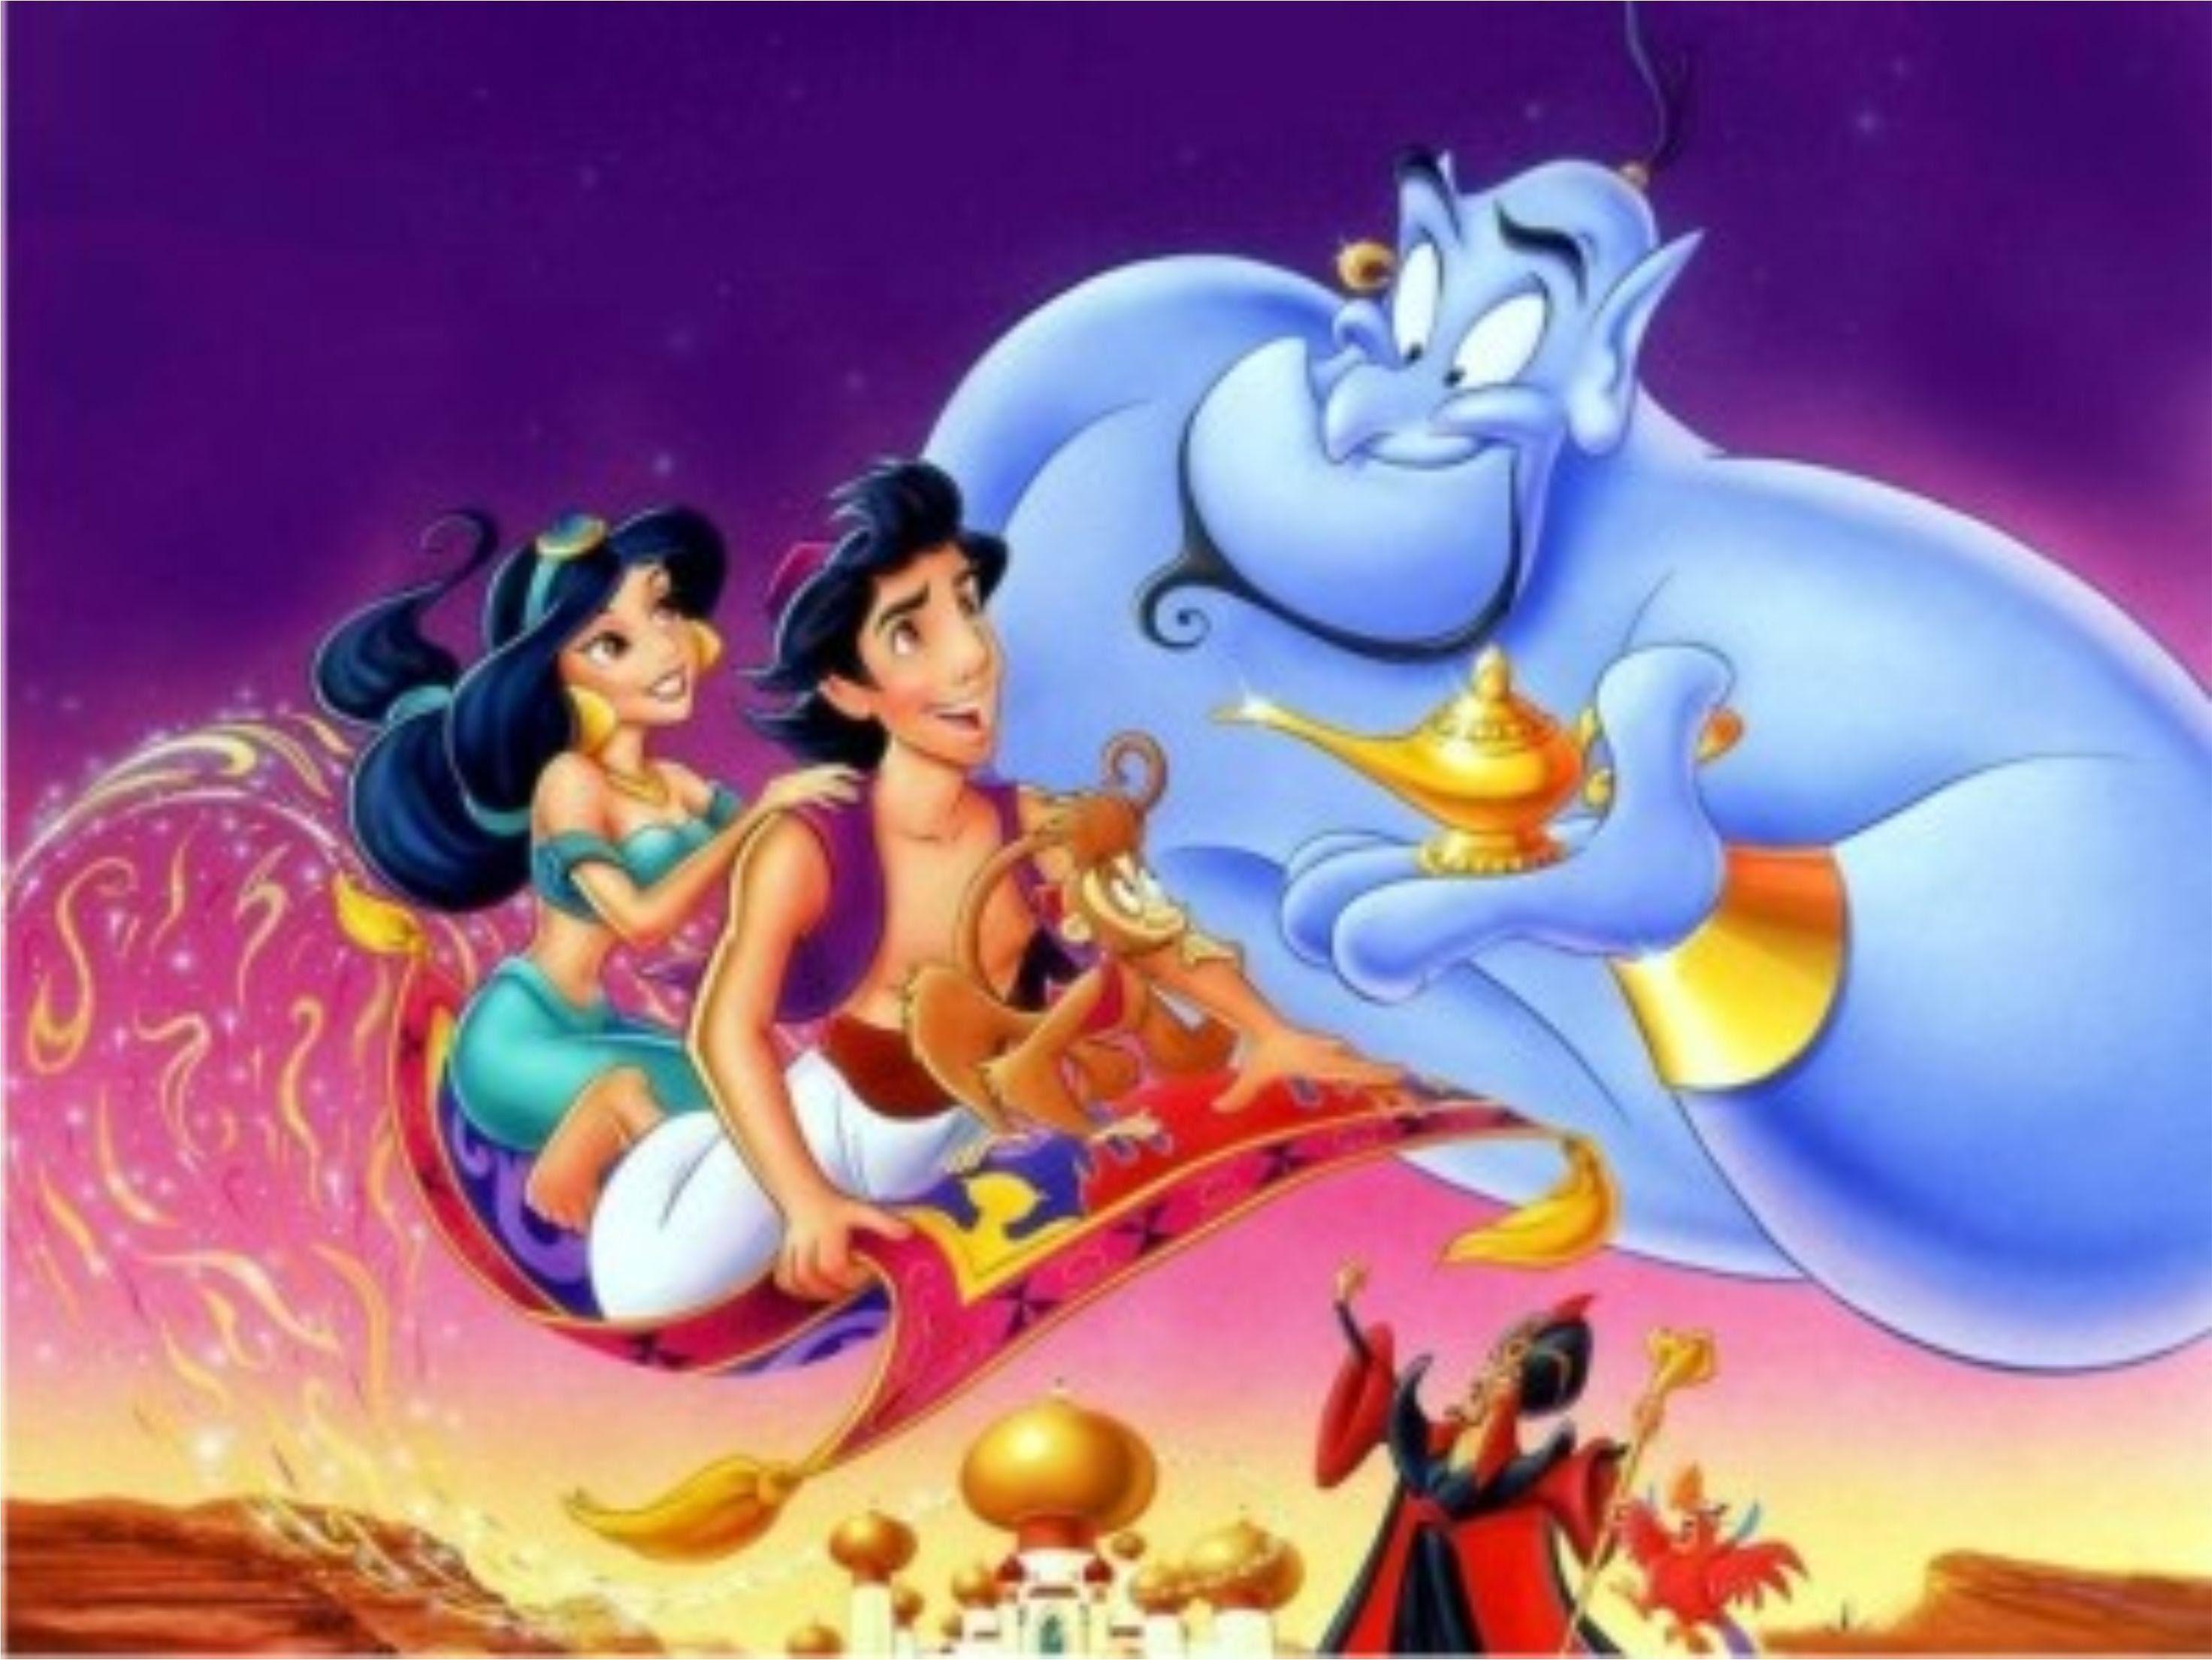 Aladdin 1992 Ron Clements John Musker Aladino Aladdin Disney